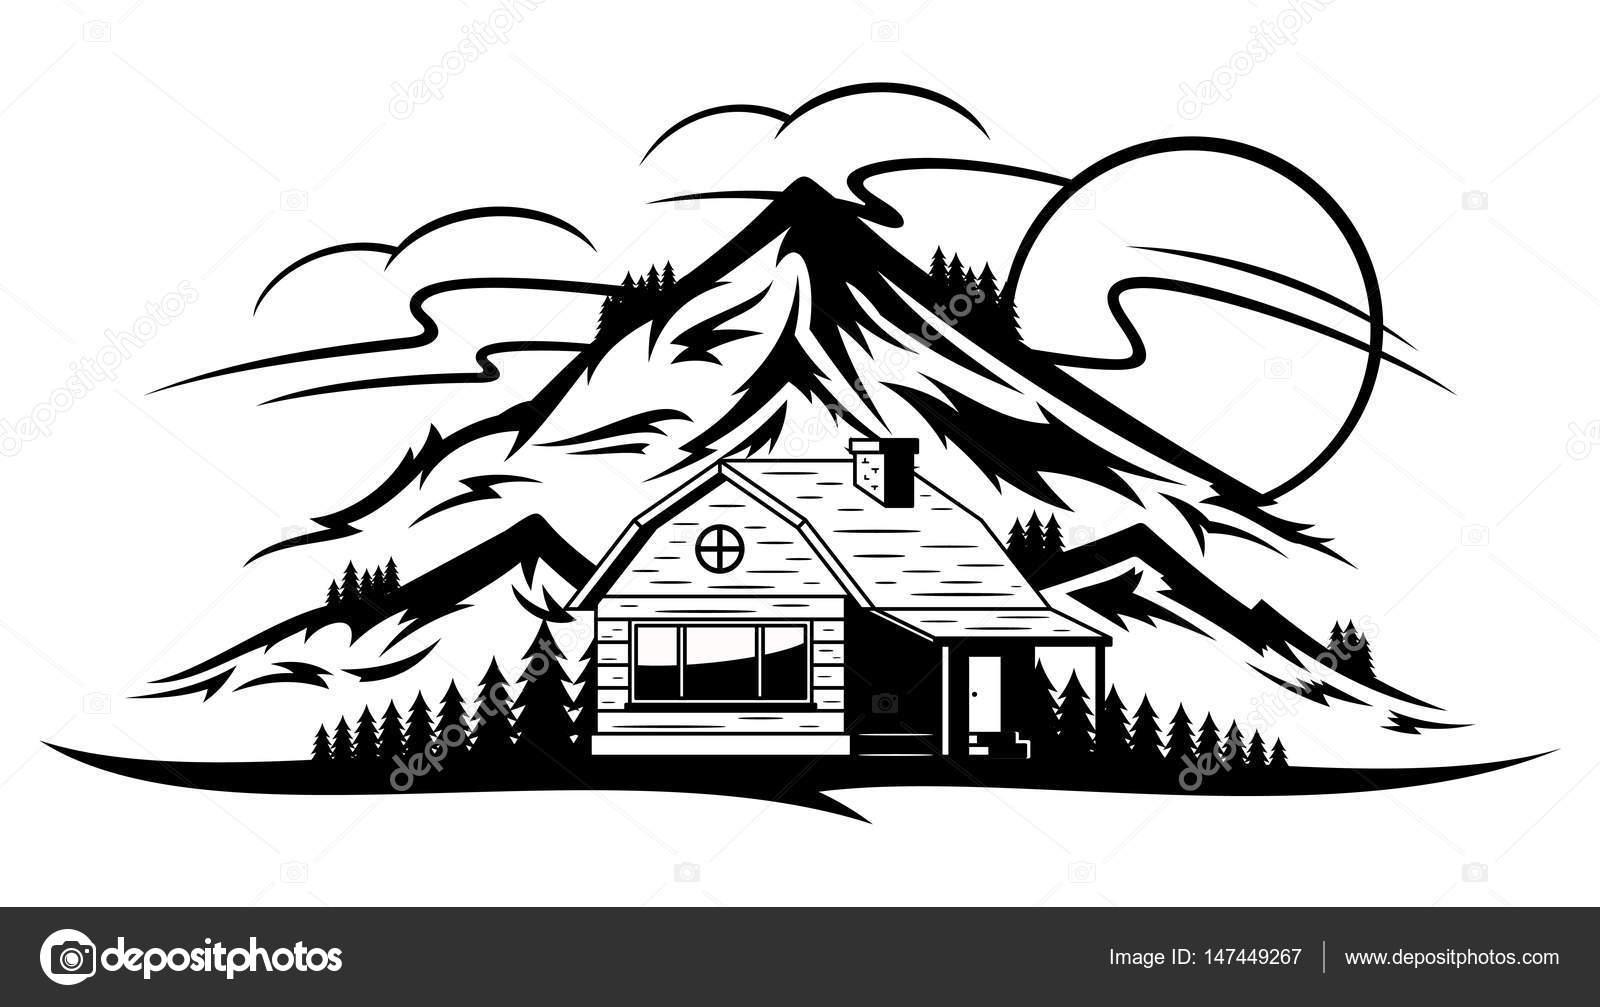 Dibujos Cabanas En La Montana